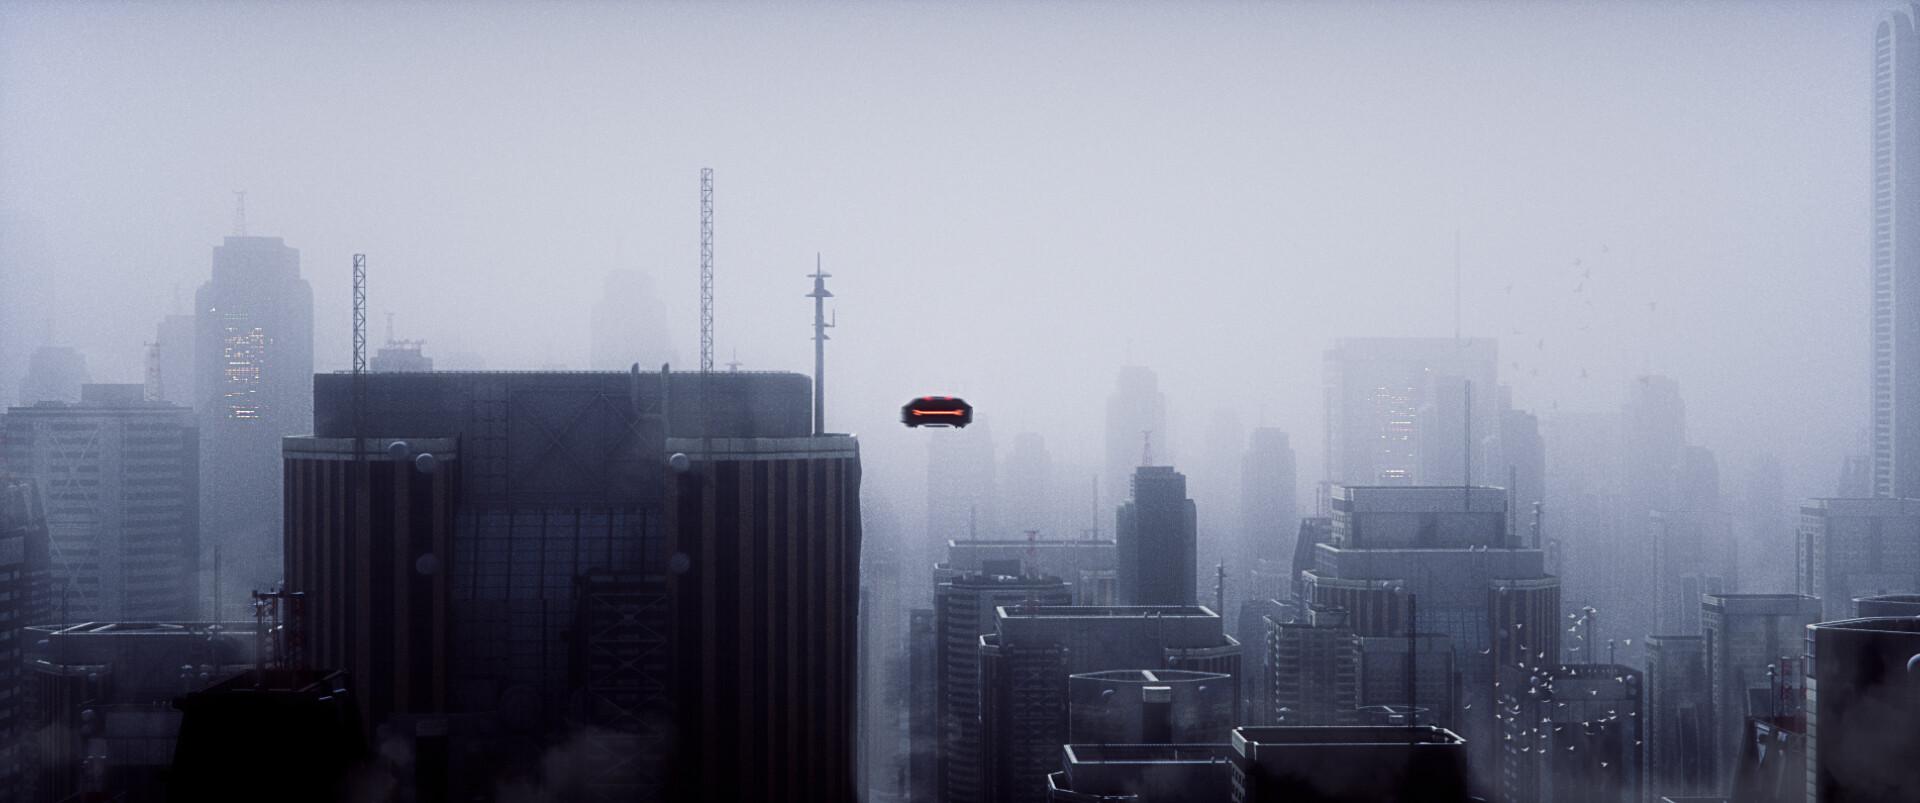 Bat max fog abuse morning art 1